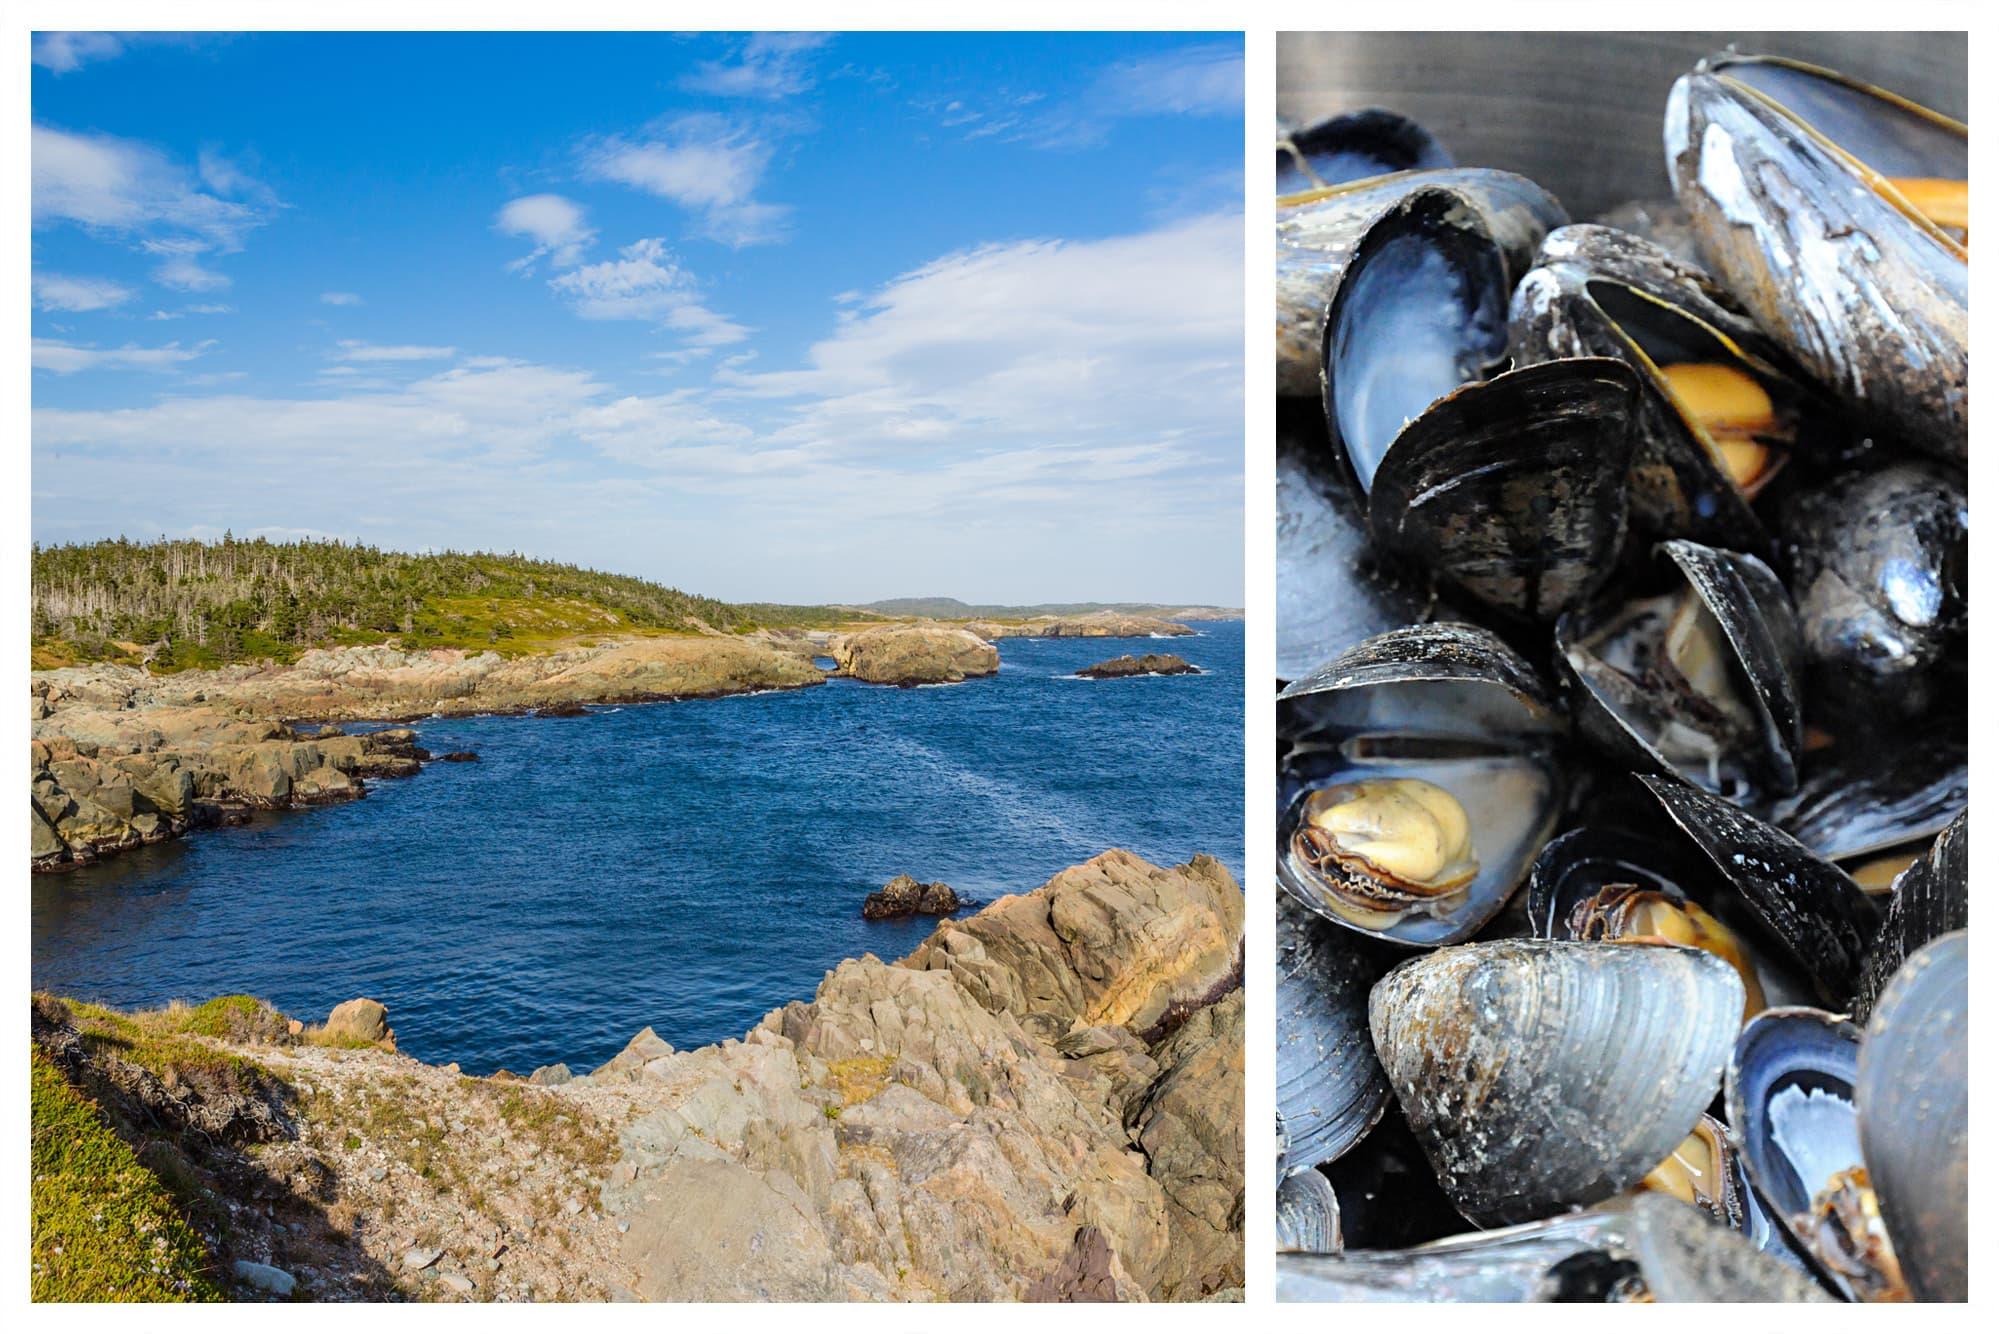 Membertou, Nova Scotia Vacation Places to Visit